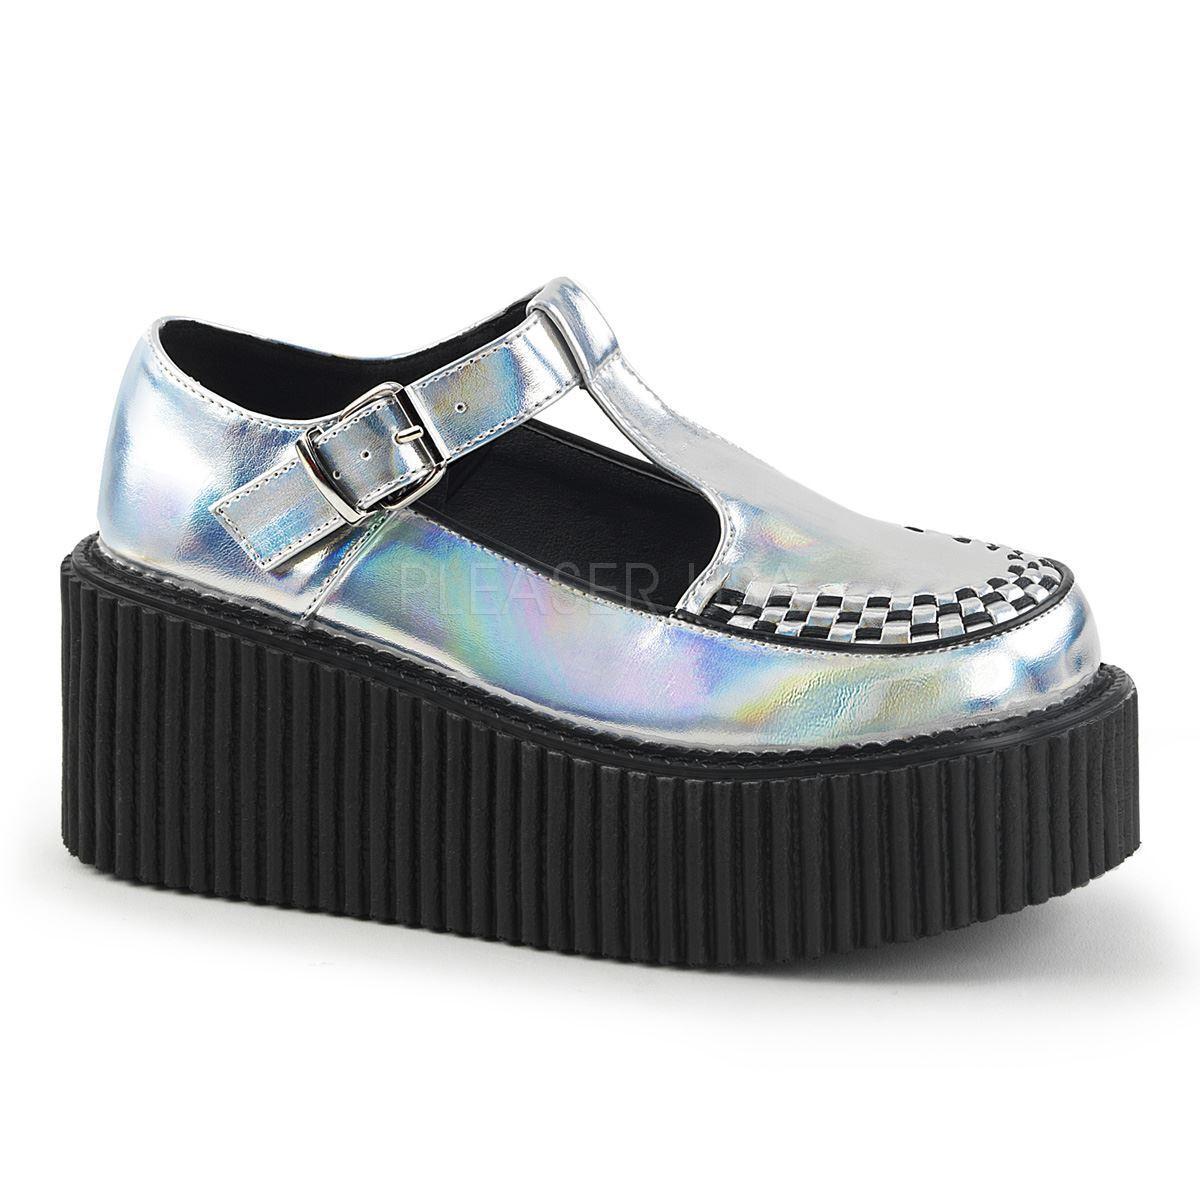 ARA SANDALO col tacco per alto scarpe di cuoio per tacco da donna estivi pelle pearl EU 9b5166